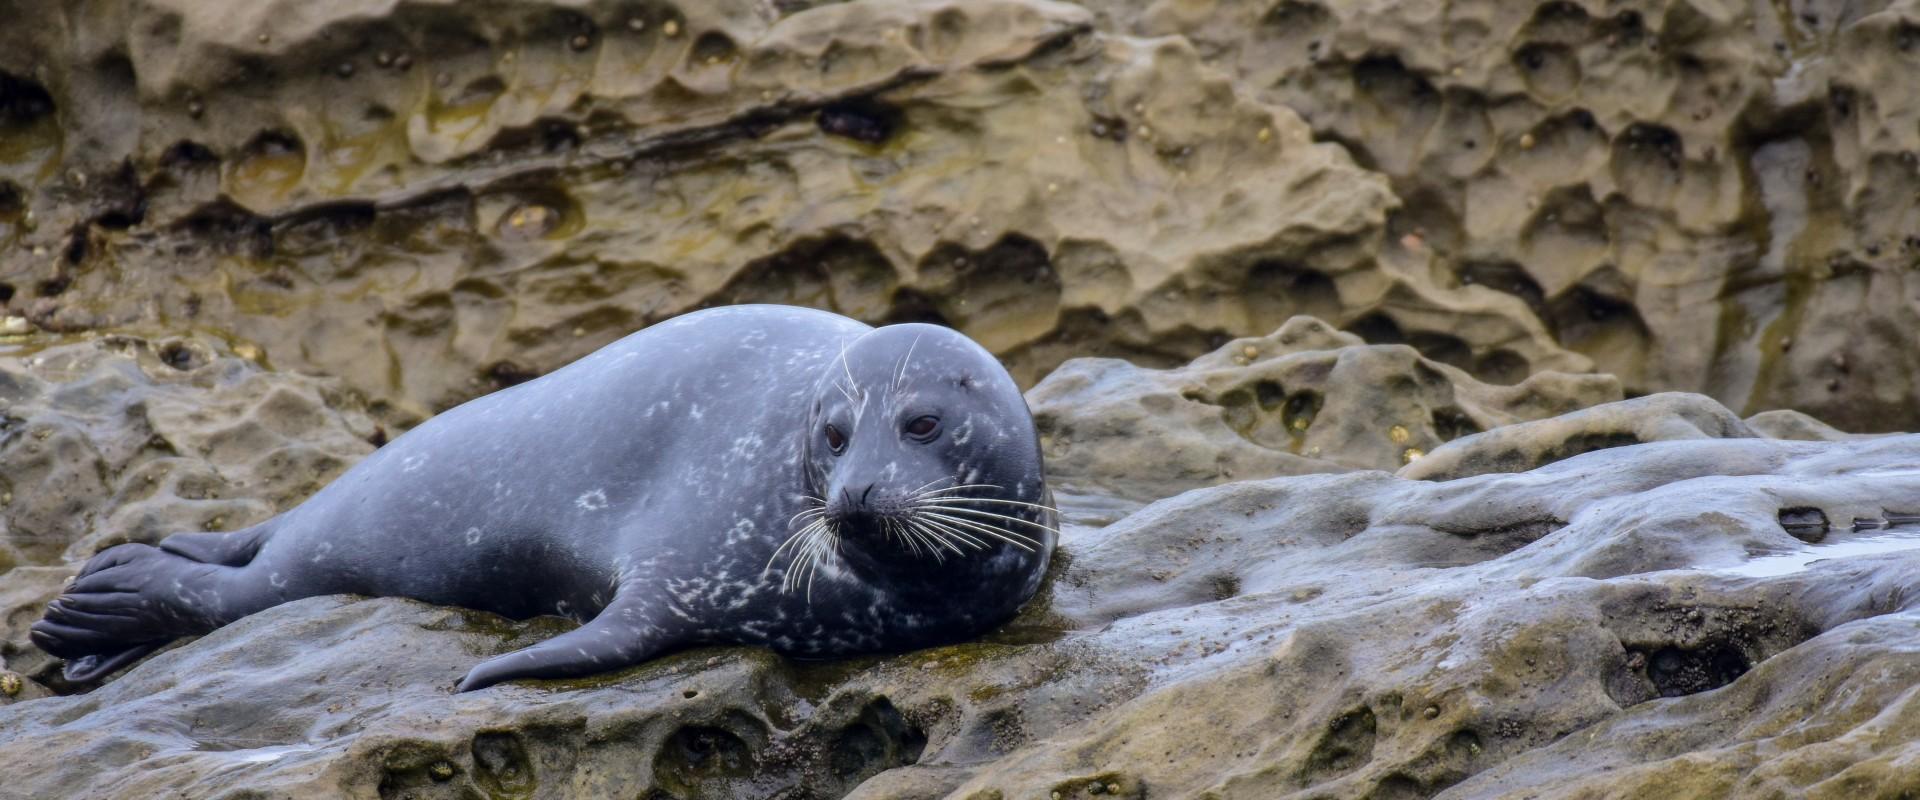 Harborb seal laying on rocks